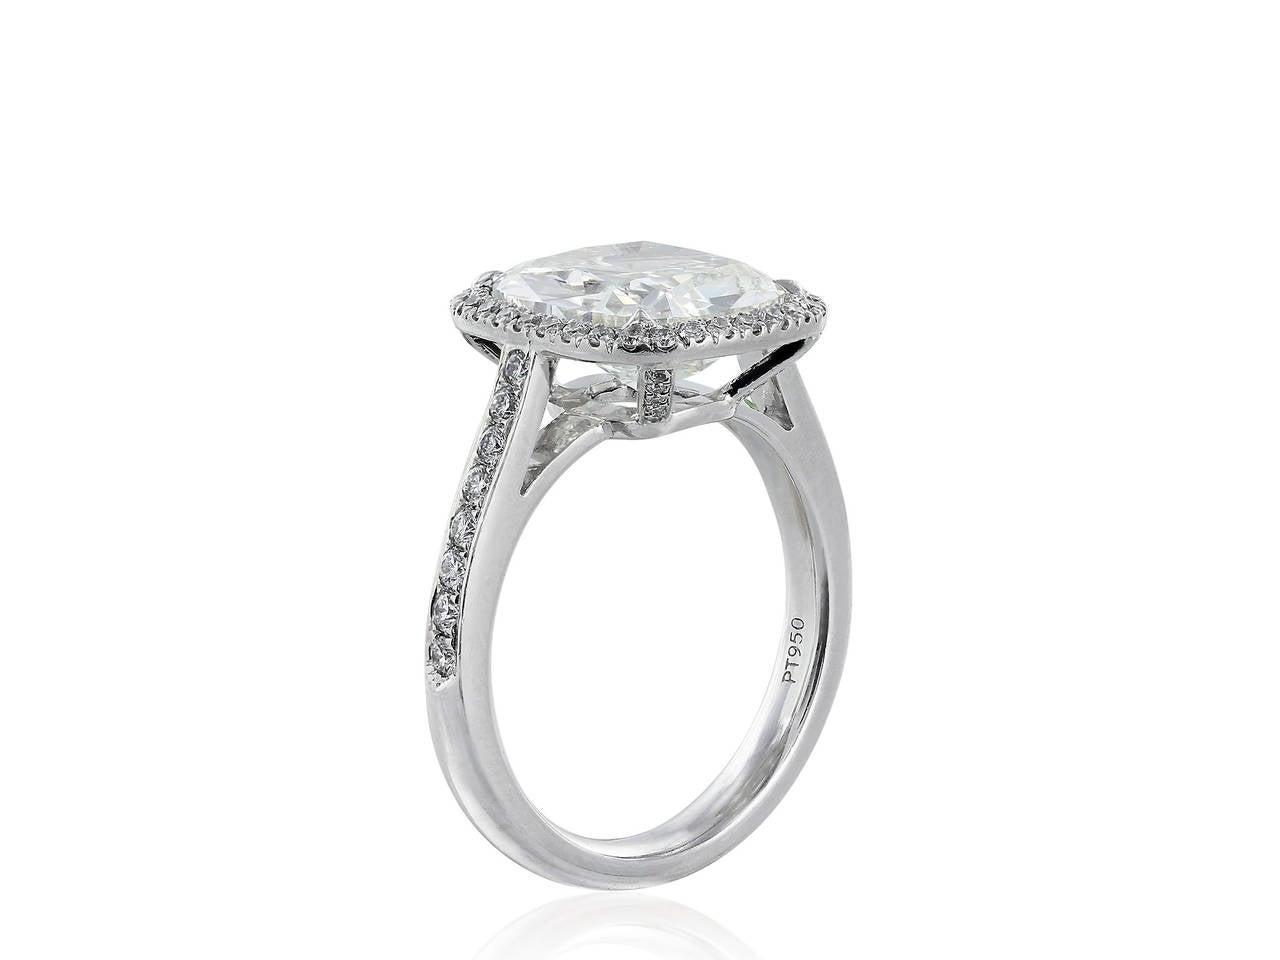 4.01 Carat GIA Certified Cushion Diamond Platinum Solitaire Engagement Ring 2